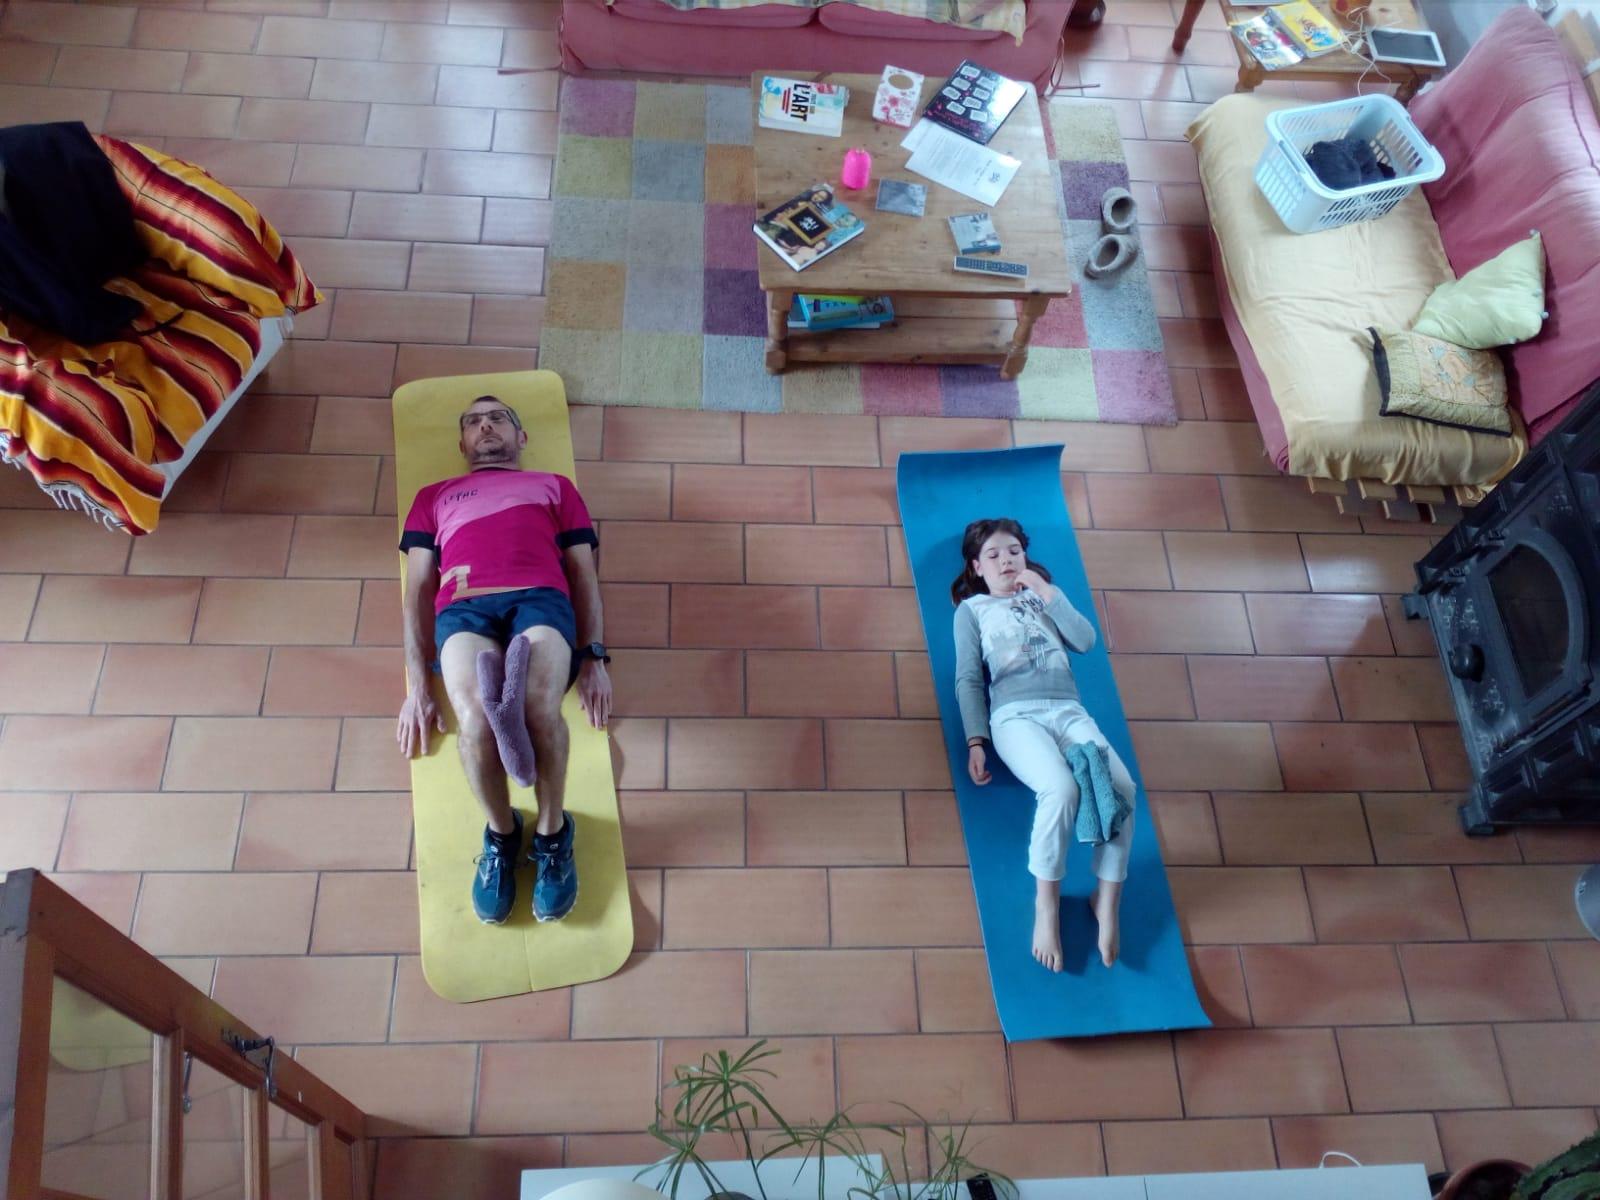 12-Sergio & sa fille en mode gainage aussi